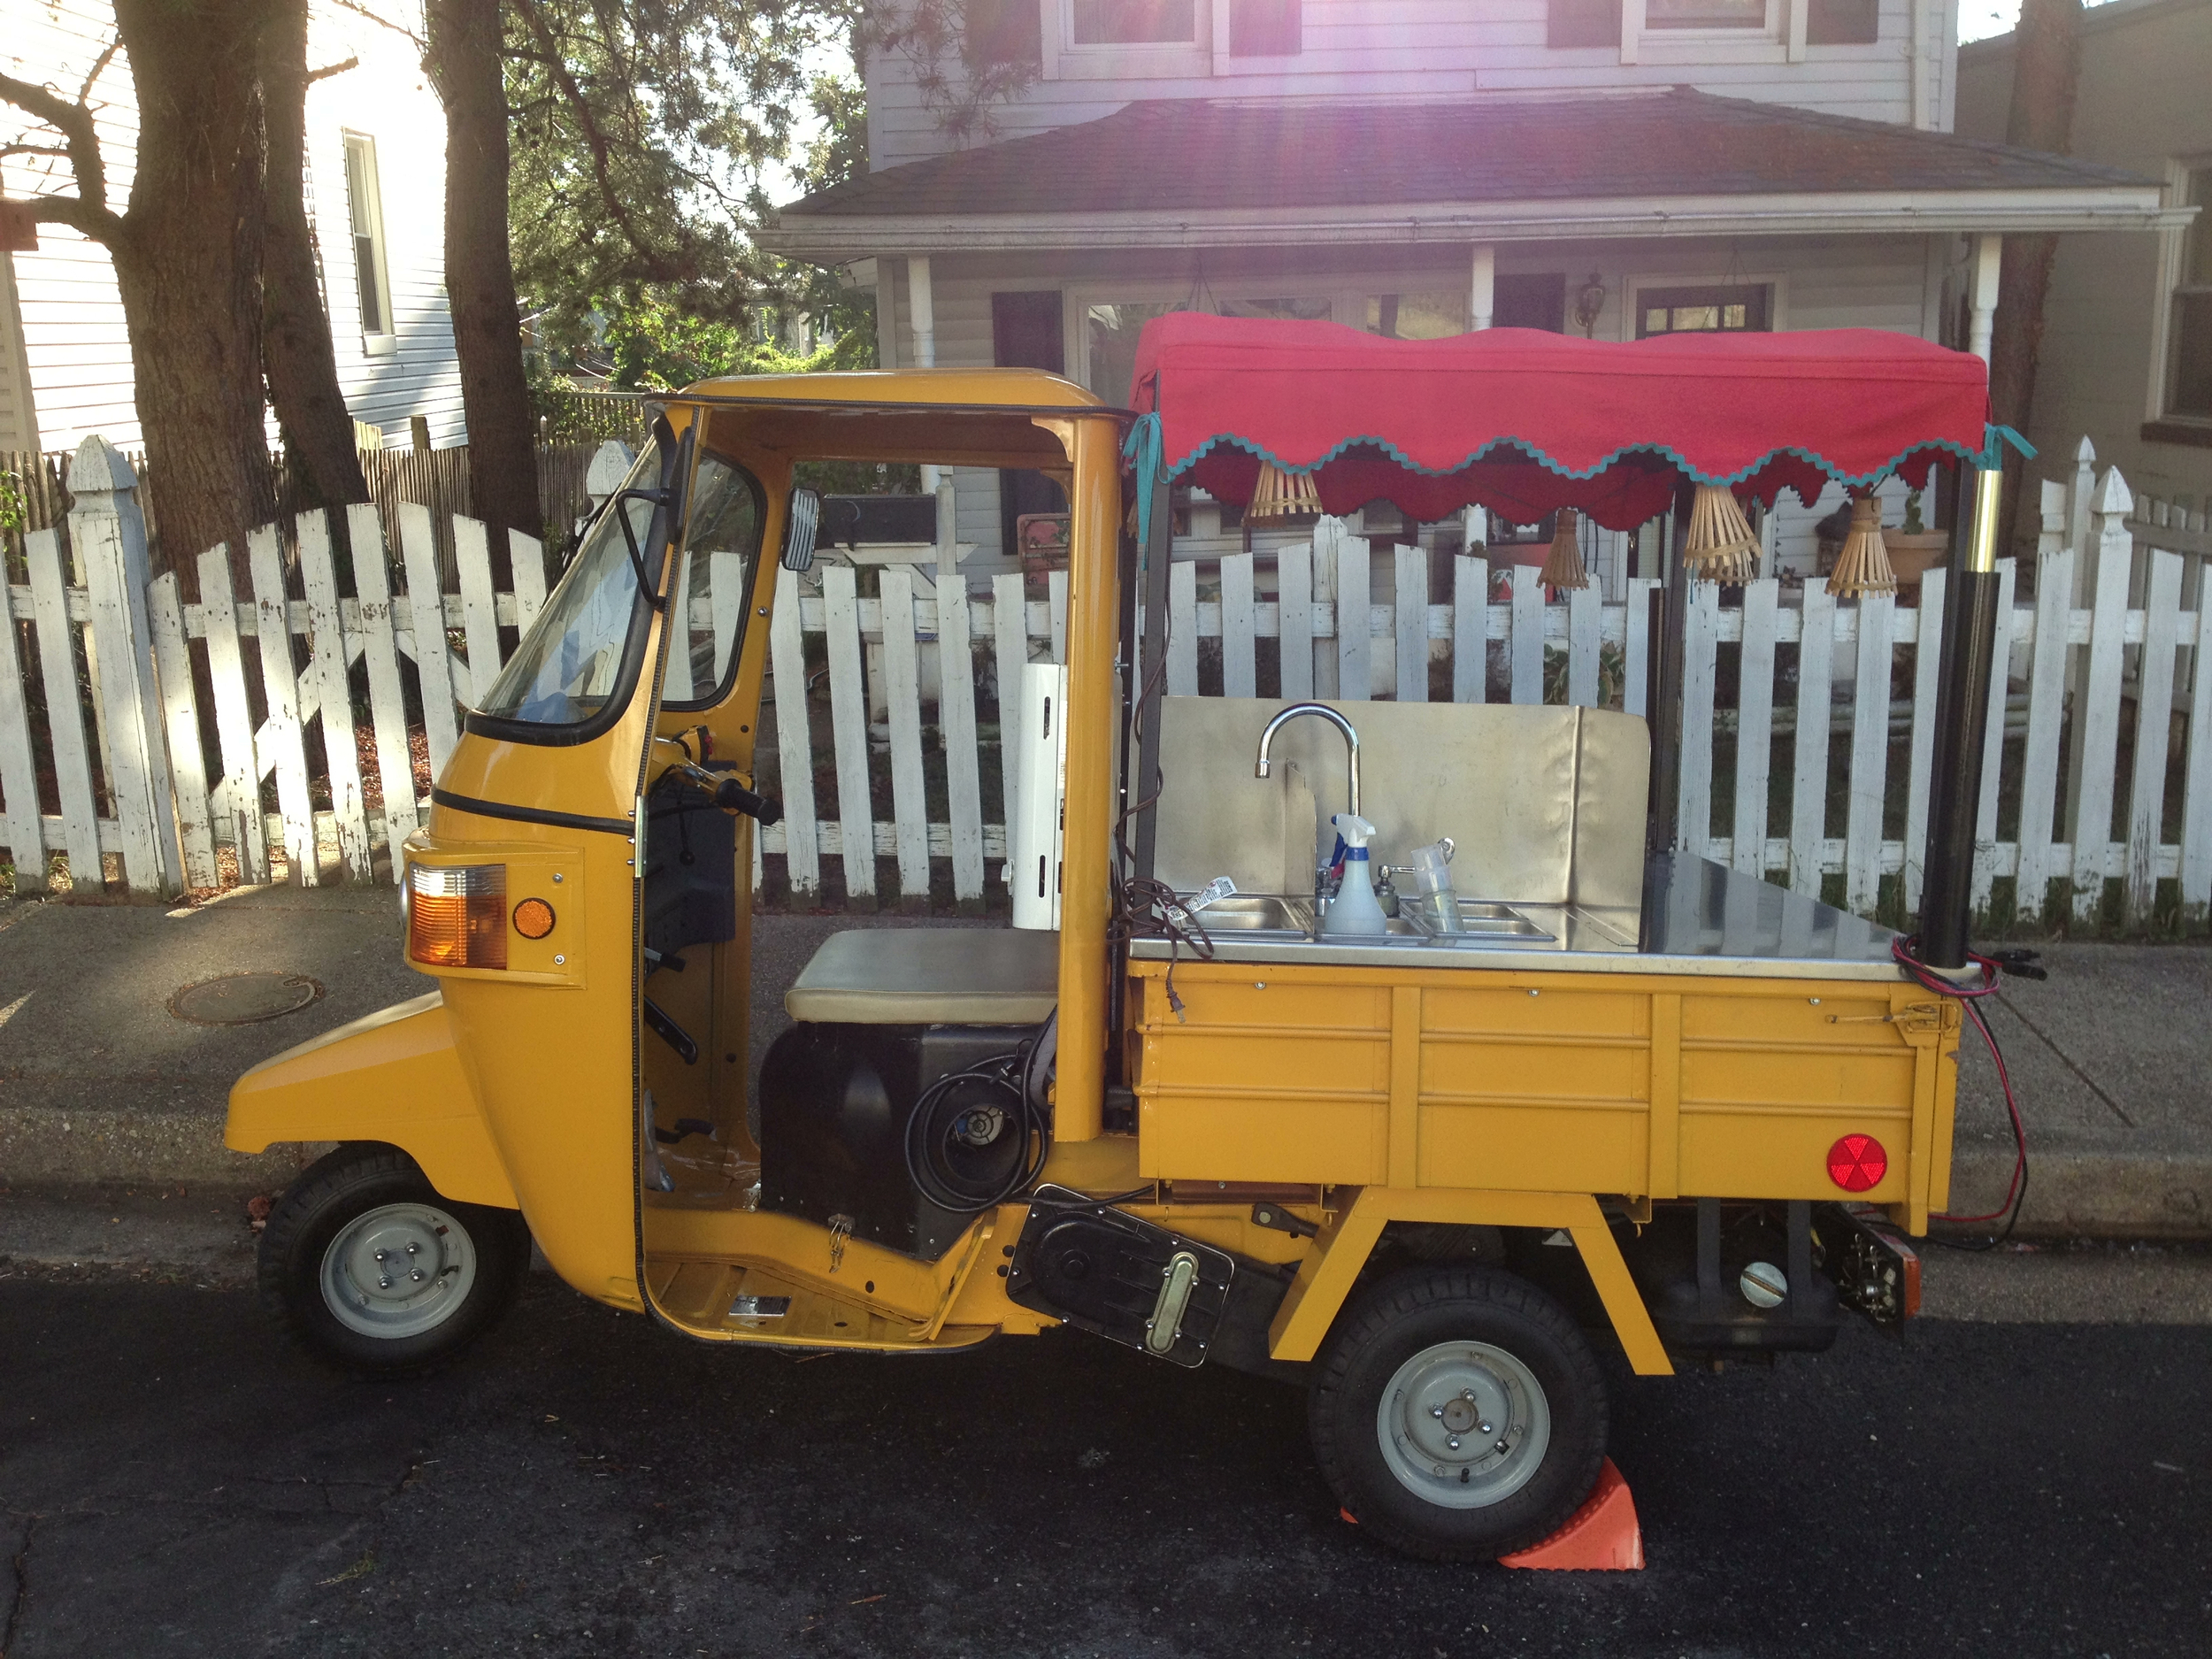 A food truck-ette.